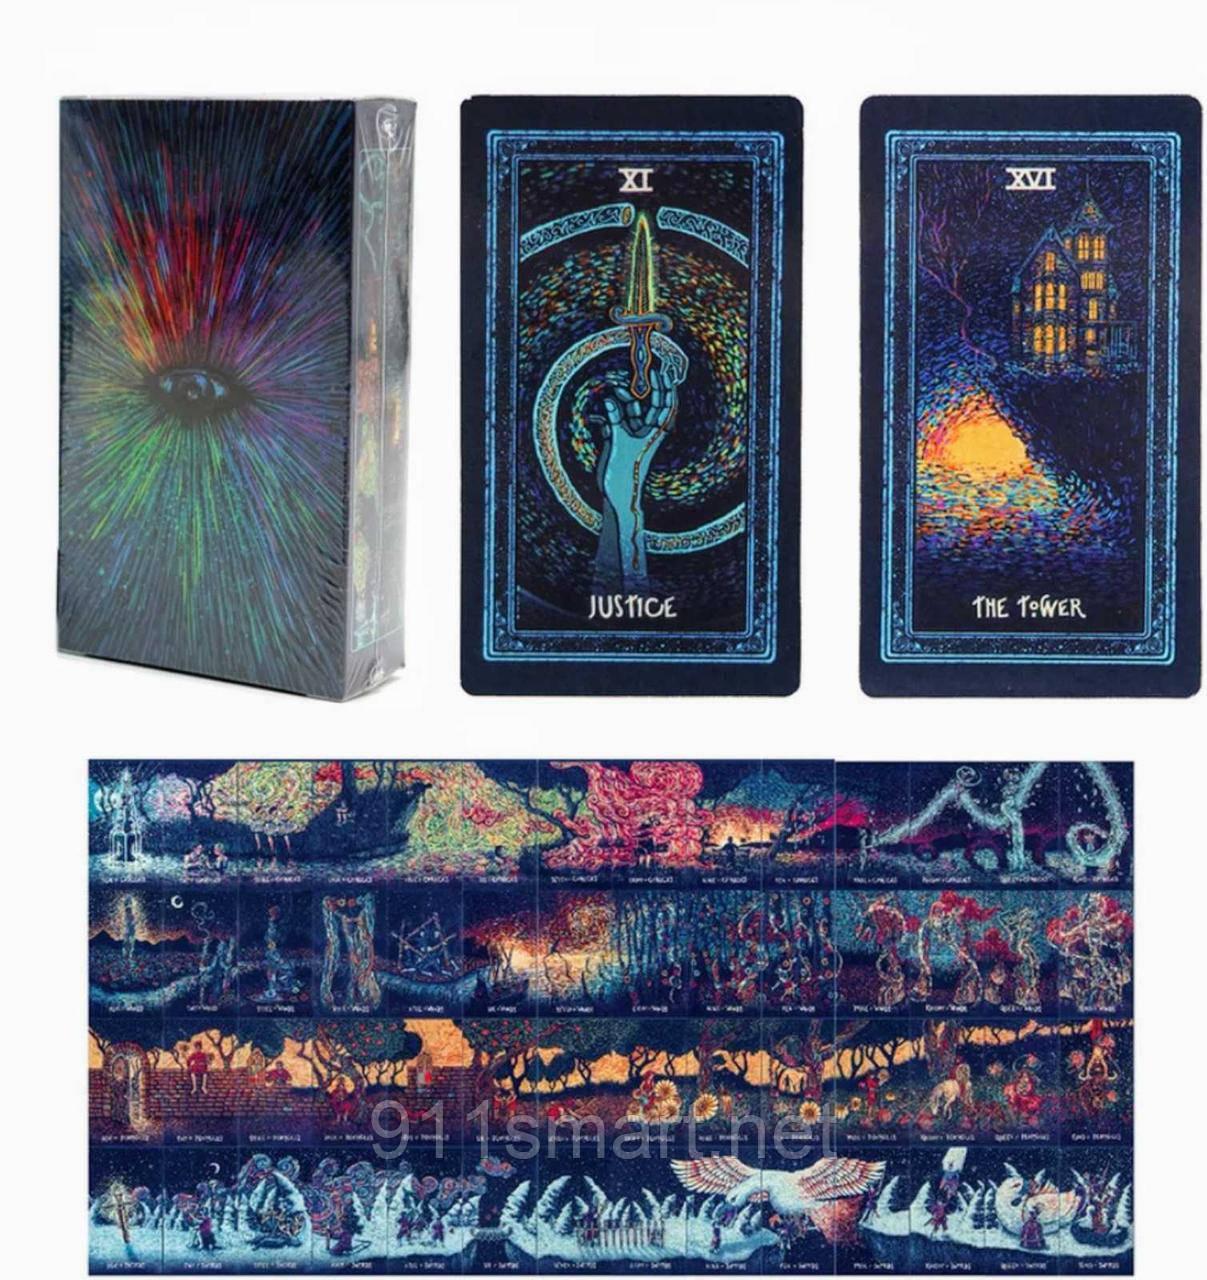 Таро Призма (Prisma visions tarot) с Серебряным срезом. Адекватное Таро карты.